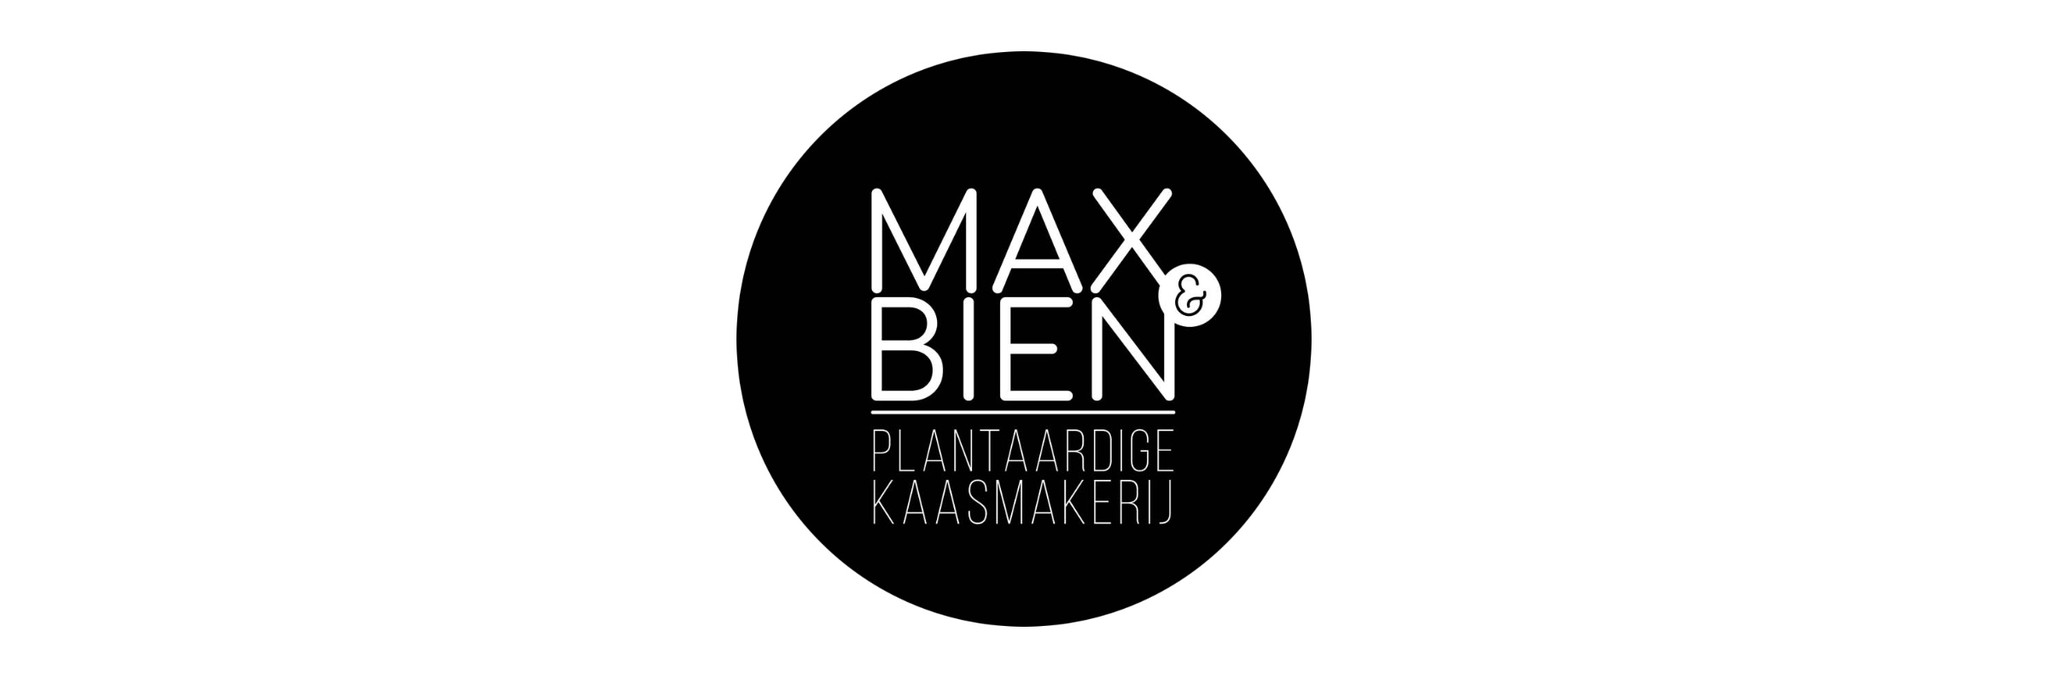 MAX&BIEN